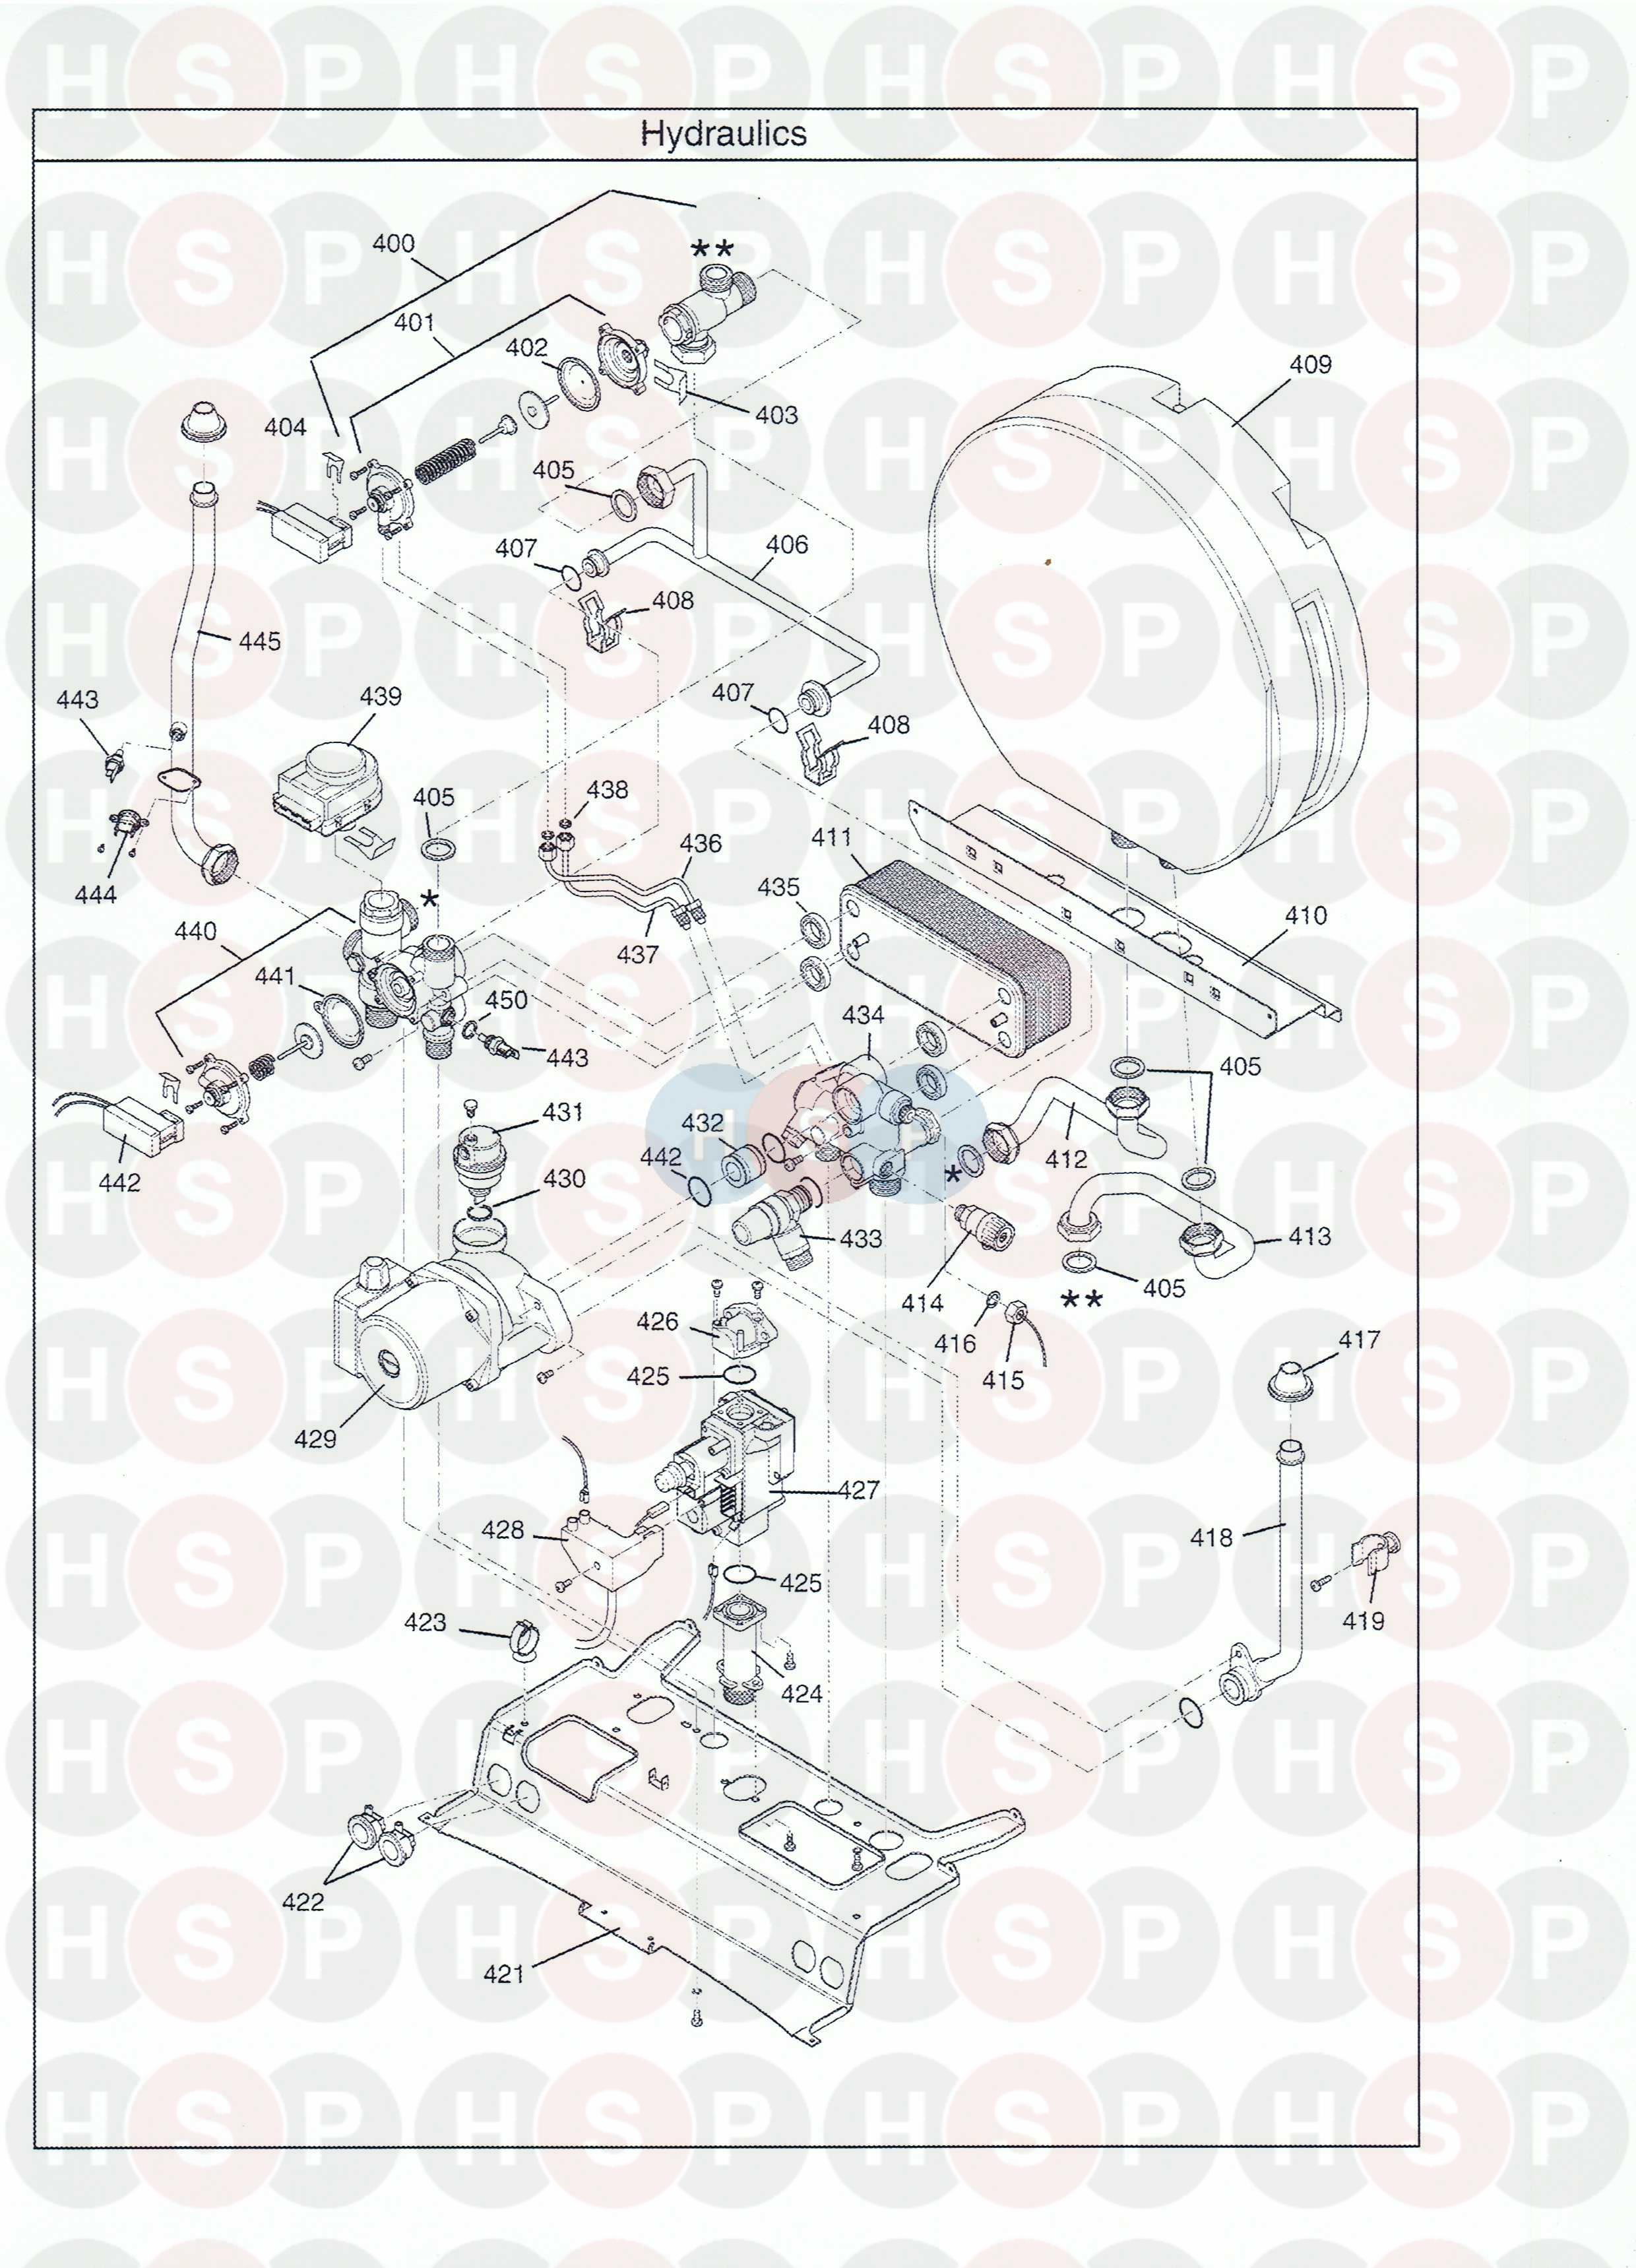 baxi combi instant 105e he appliance diagram  hydraulics